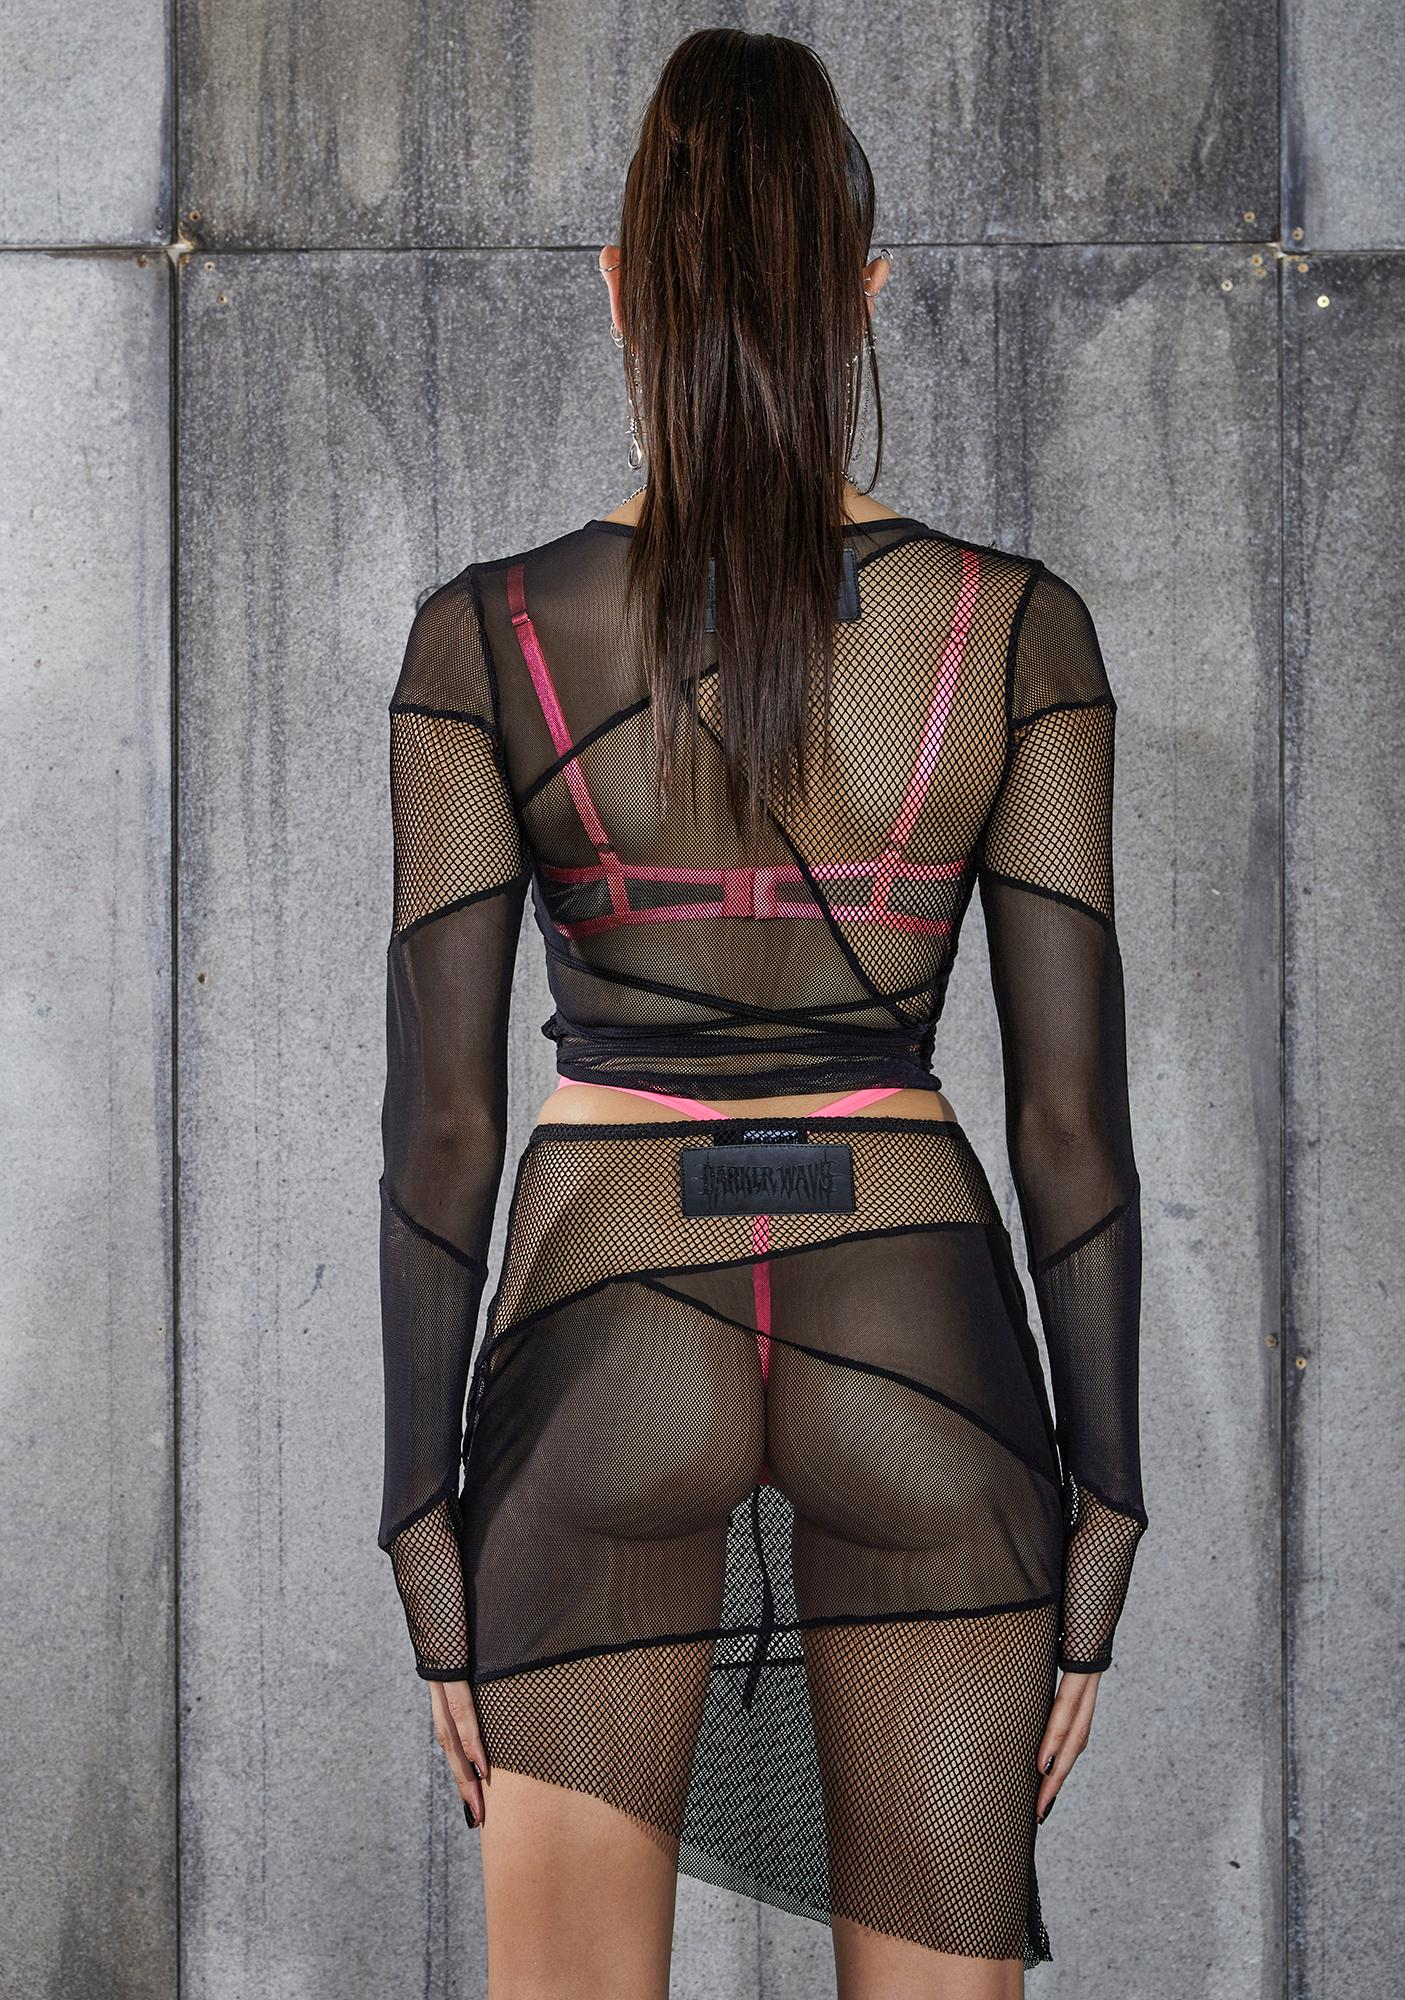 DARKER WAVS Snare Fishnet And Mesh Patchwork Skirt